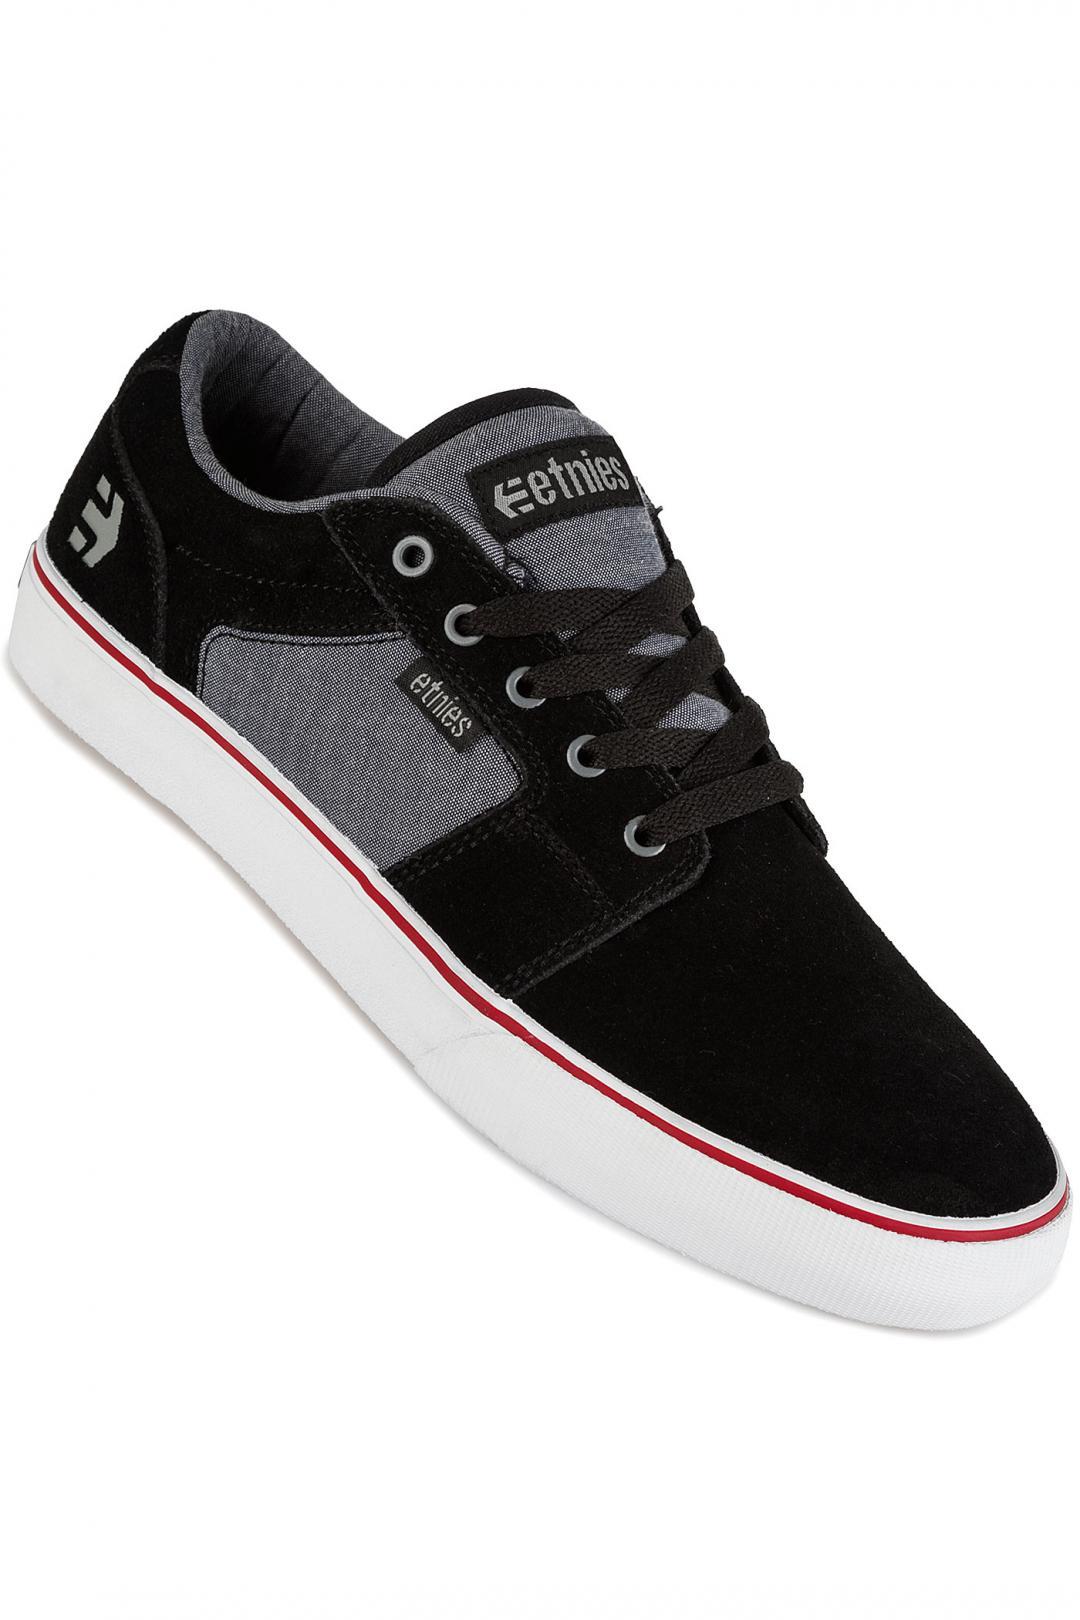 Uomo Etnies Barge LS black charcoal silver | Sneakers low top